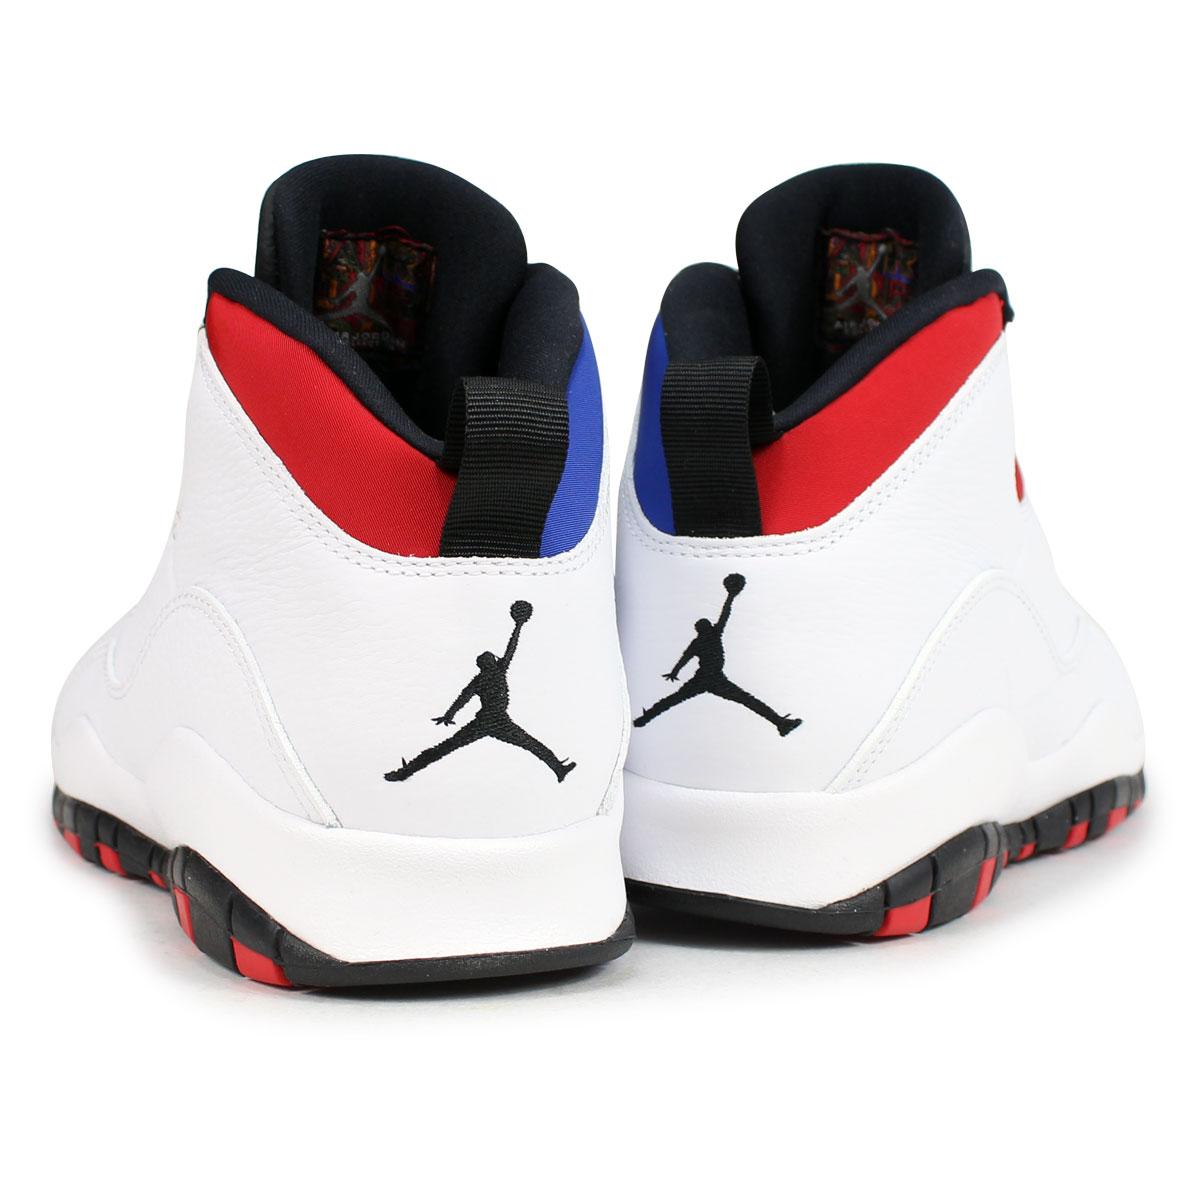 359a6ff0427d6b NIKE AIR JORDAN 10 RETRO RUSSELL WESTBROOK Nike Air Jordan 10 nostalgic  sneakers men 310